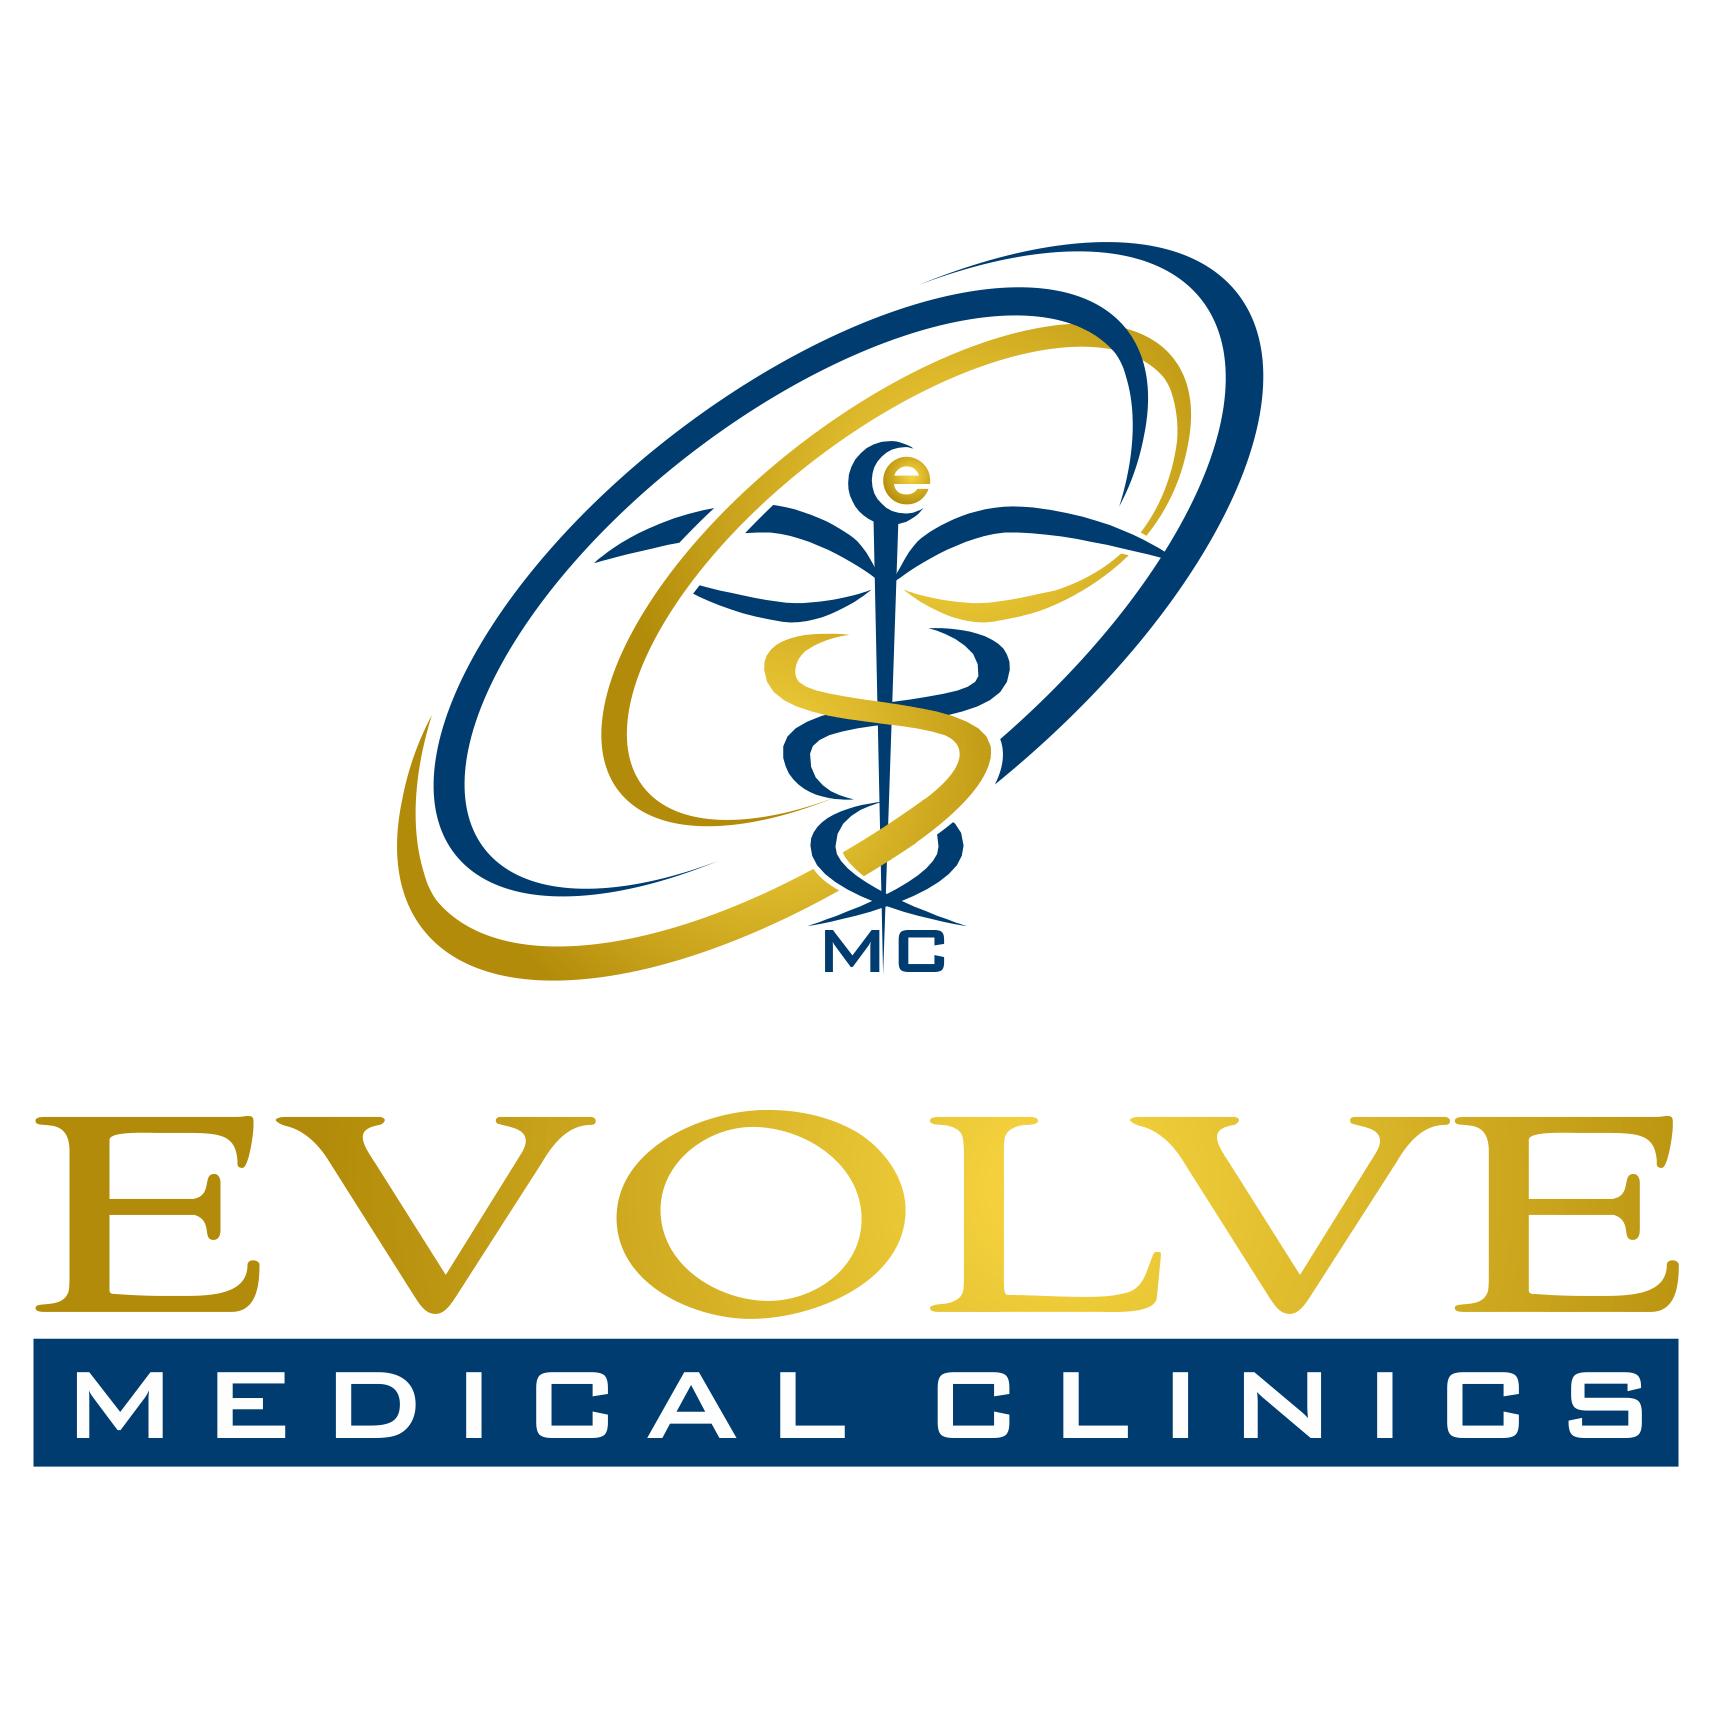 Evolve Medical Clinics - ad image